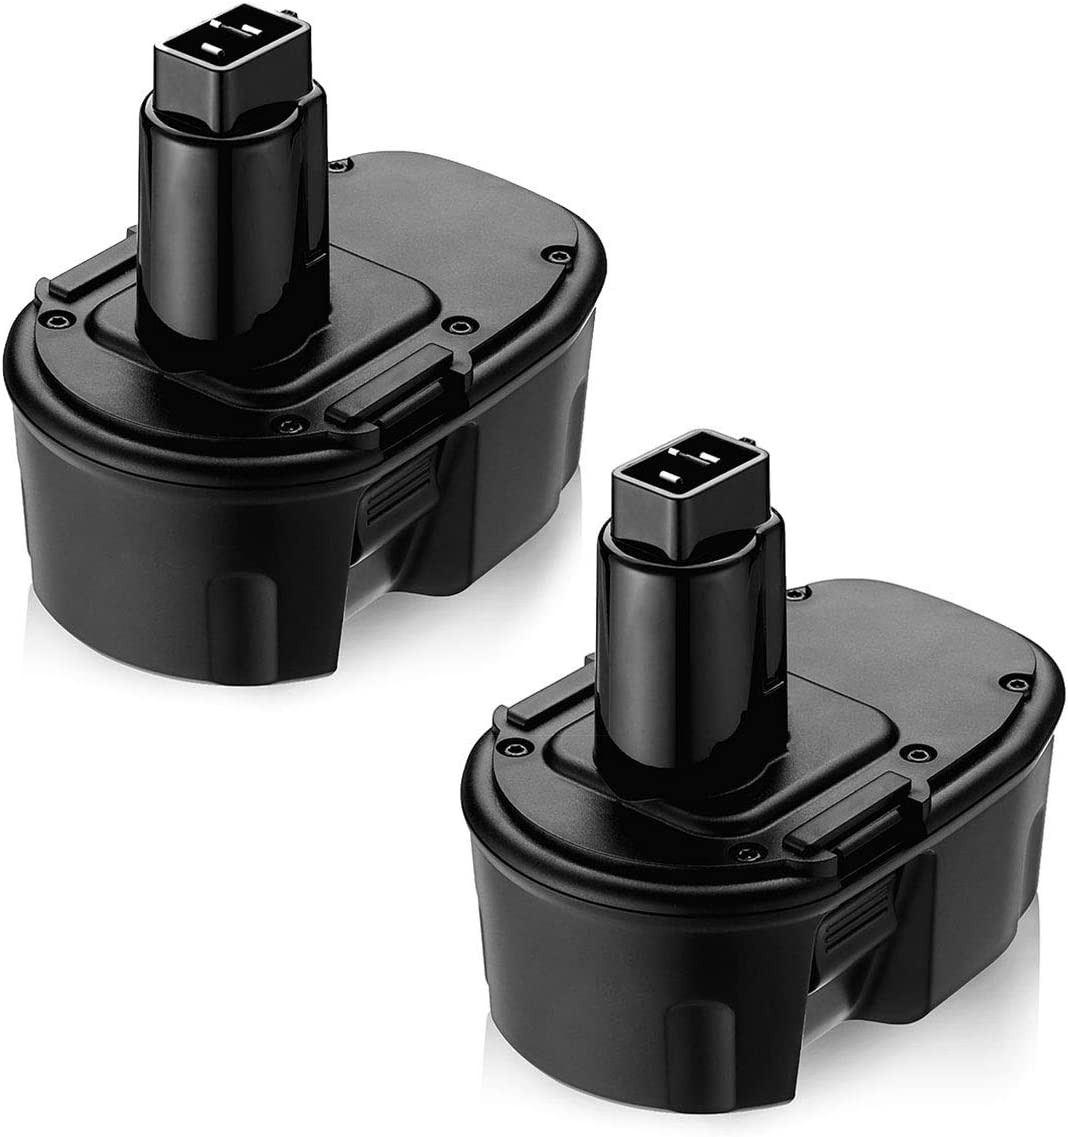 14.4V Replacement Battery Compatible with Dewalt 14.4V Battery Ni-MH DW9091 DW9094 DE9091 DE9092 DE9038 for Dewalt 14.4V Cordless Power Tool 2 Packs